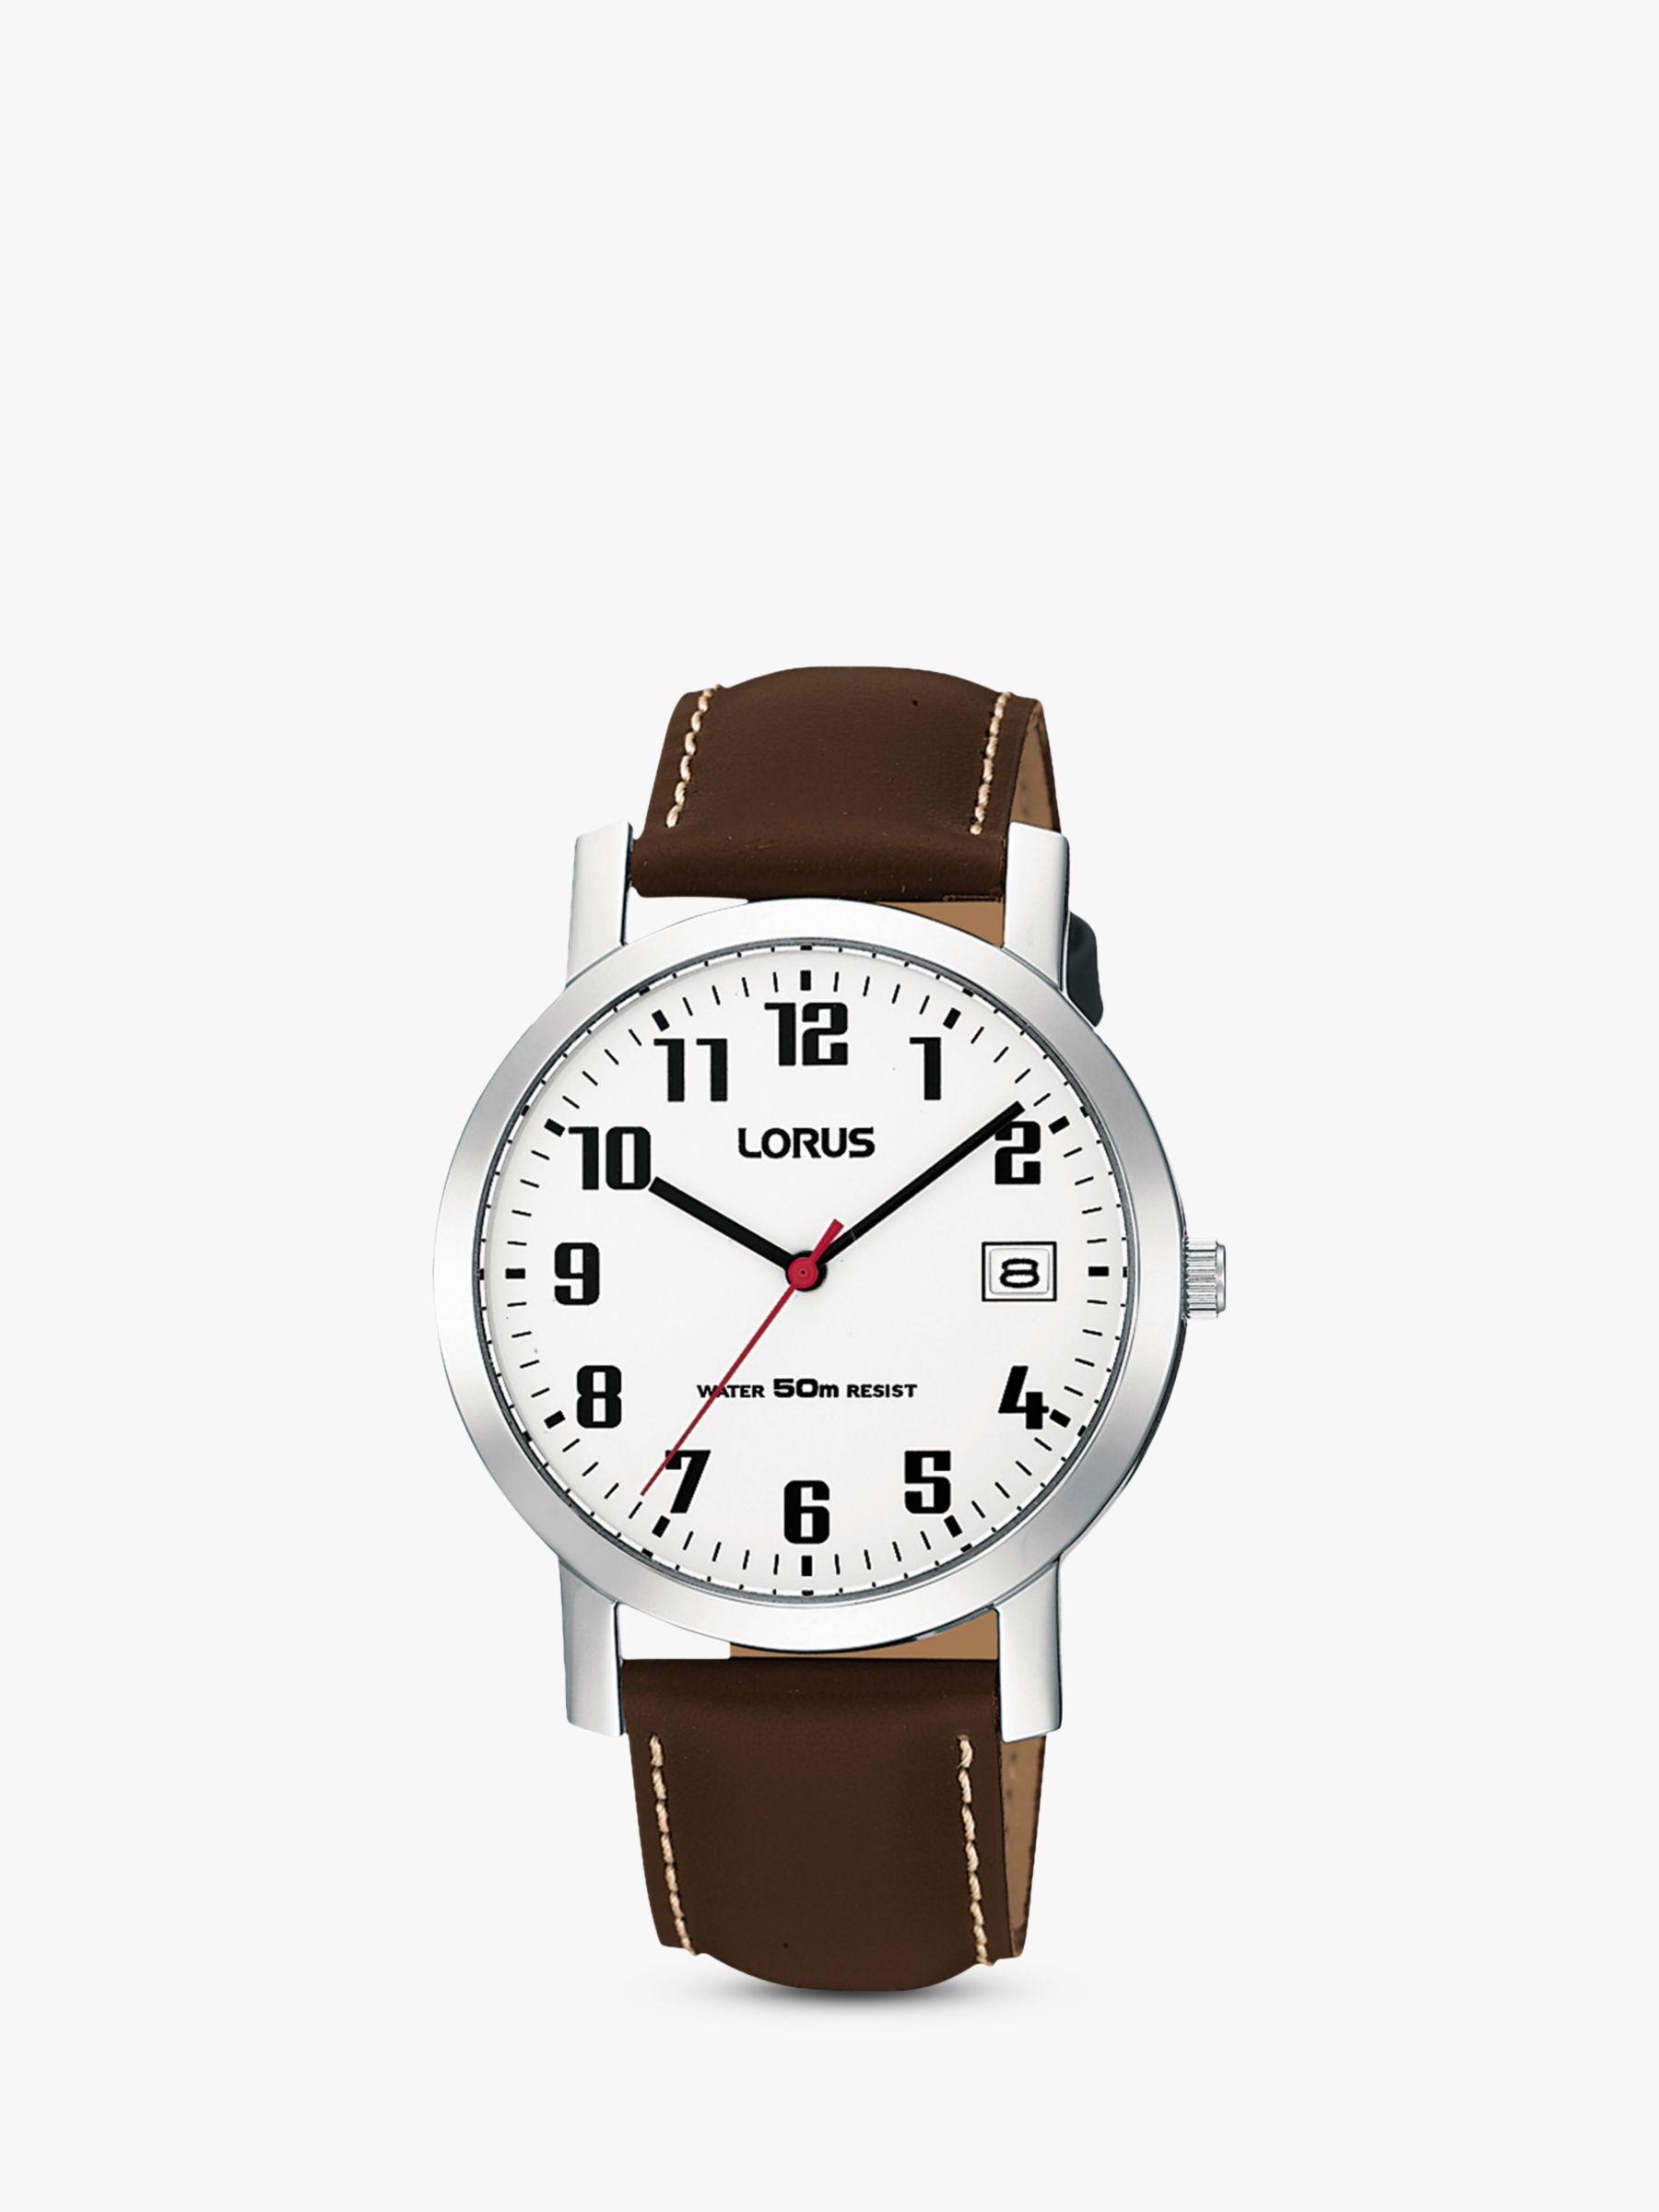 Lorus Lorus RXH65EX9 Men's Date Leather Strap Watch, Brown/White